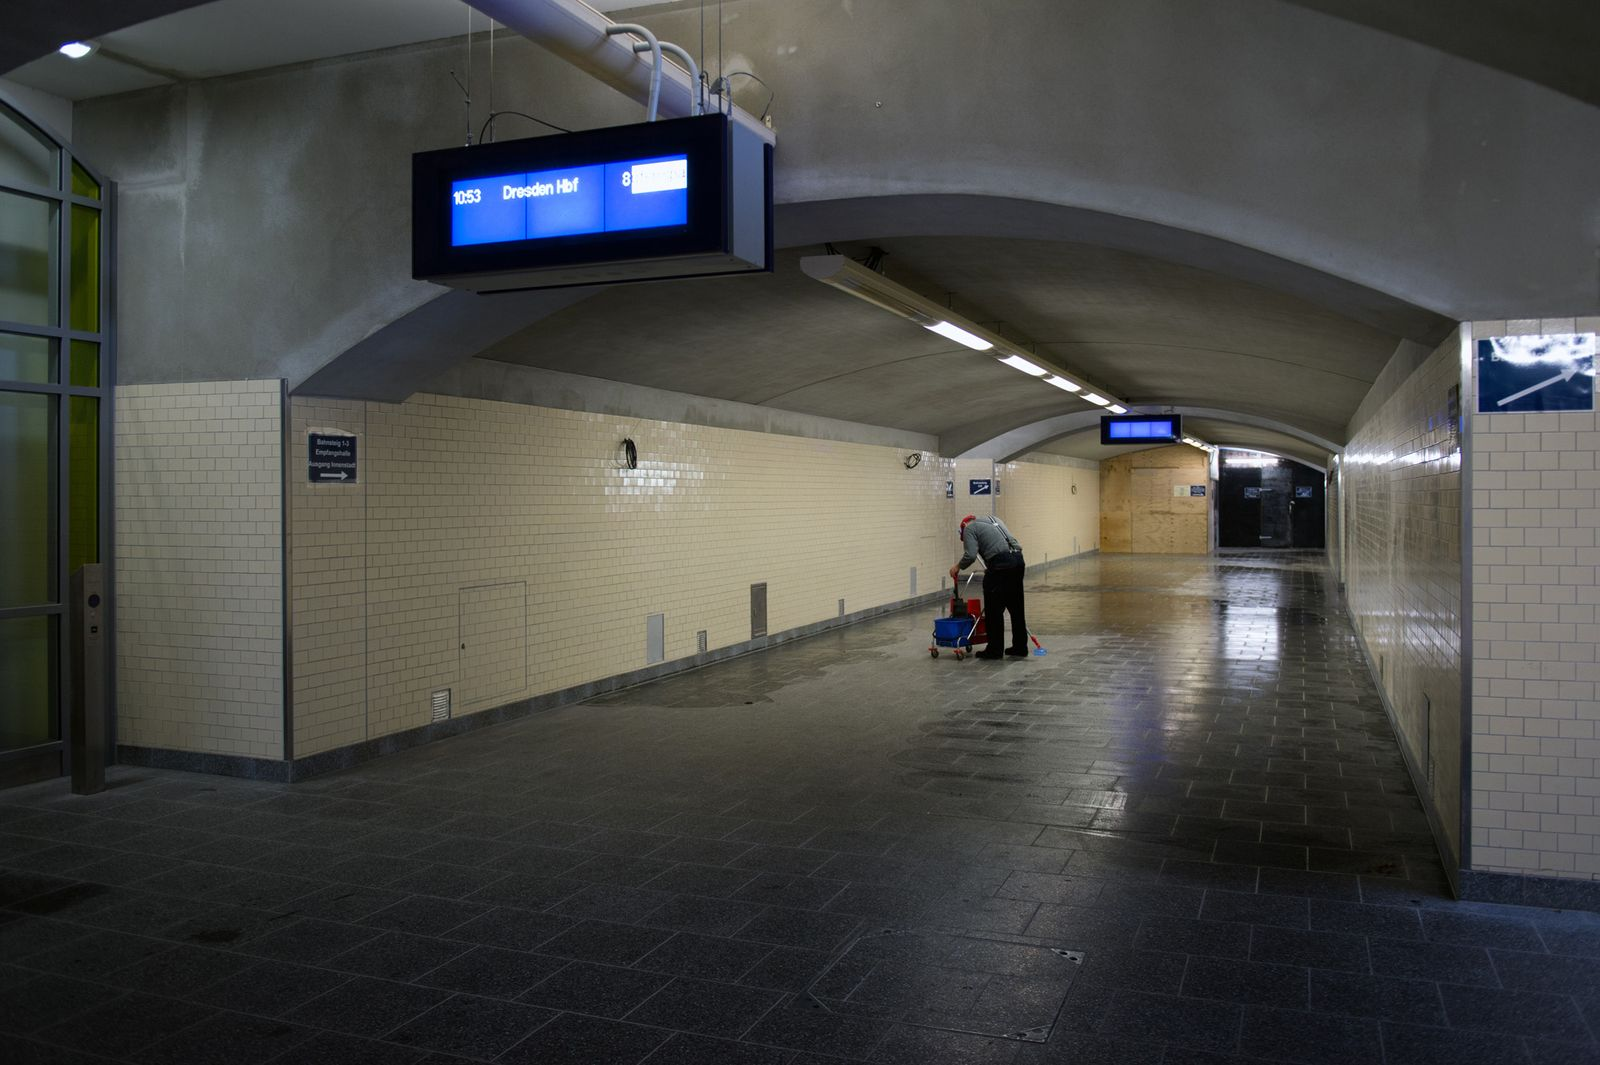 Bahnhof / digitale Anzeige / Symbol